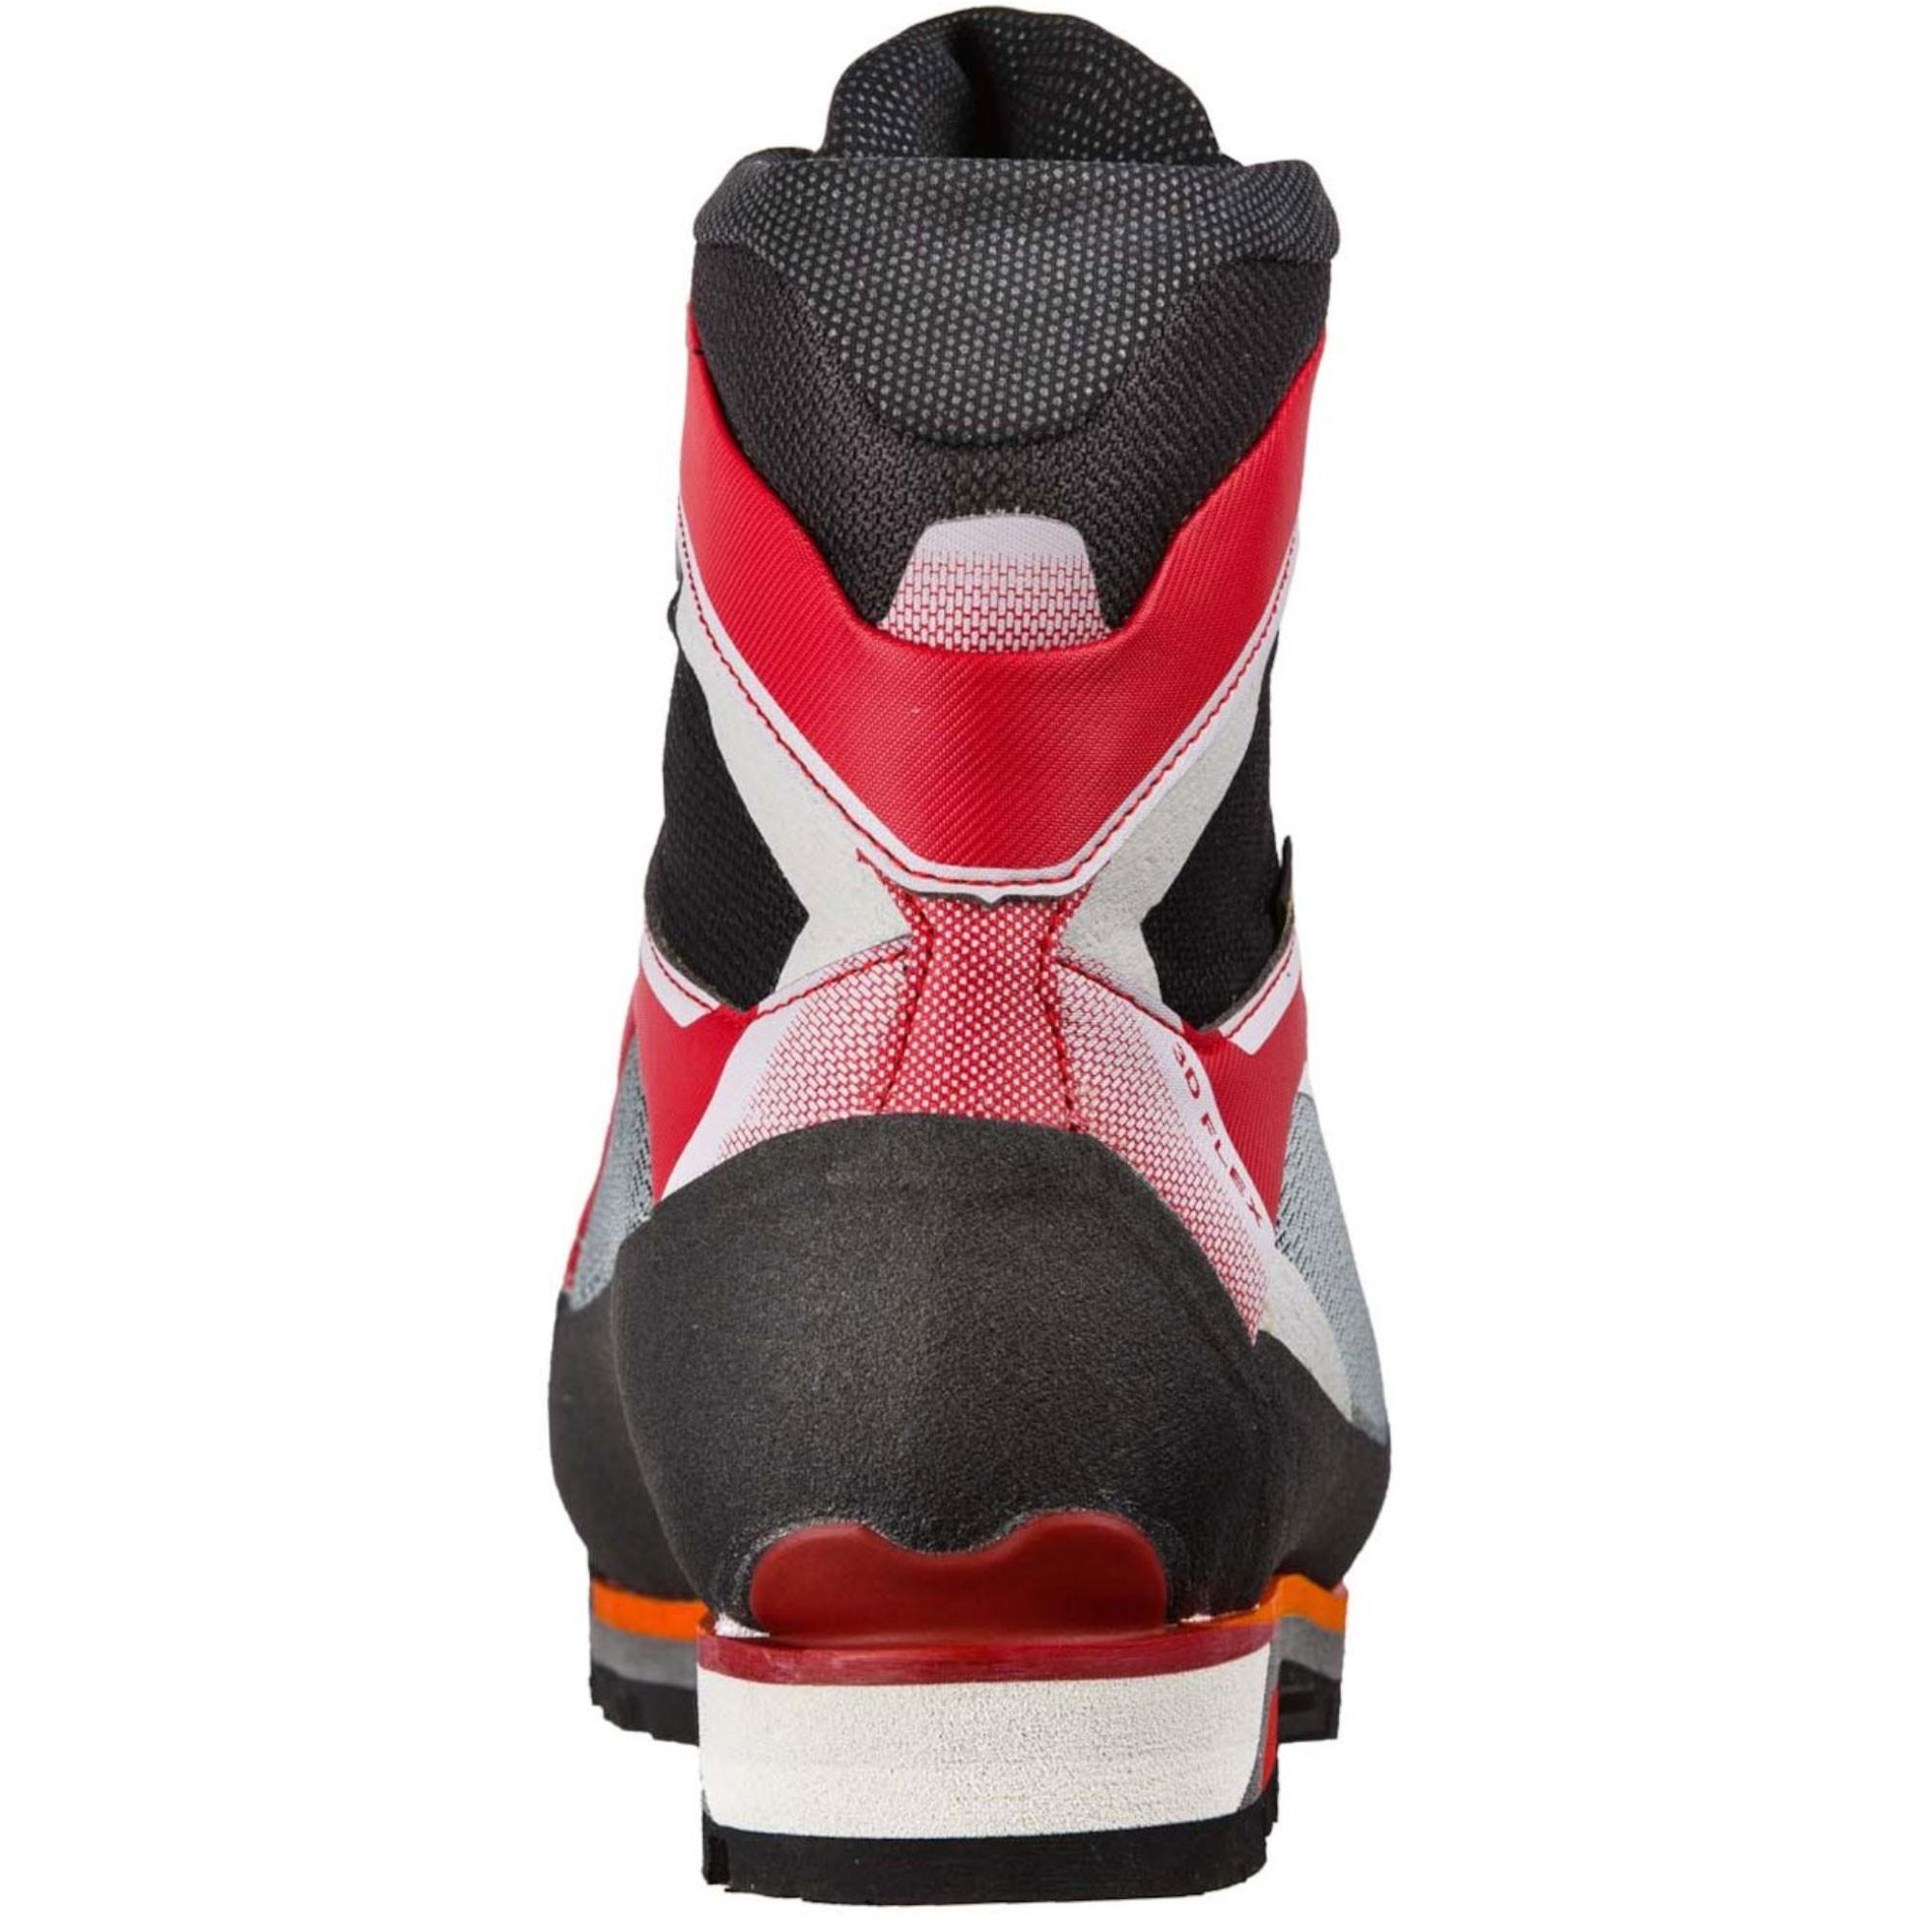 La Sportiva Trango Tower Extreme GTX Women's Mountaineering Boot - Garnet